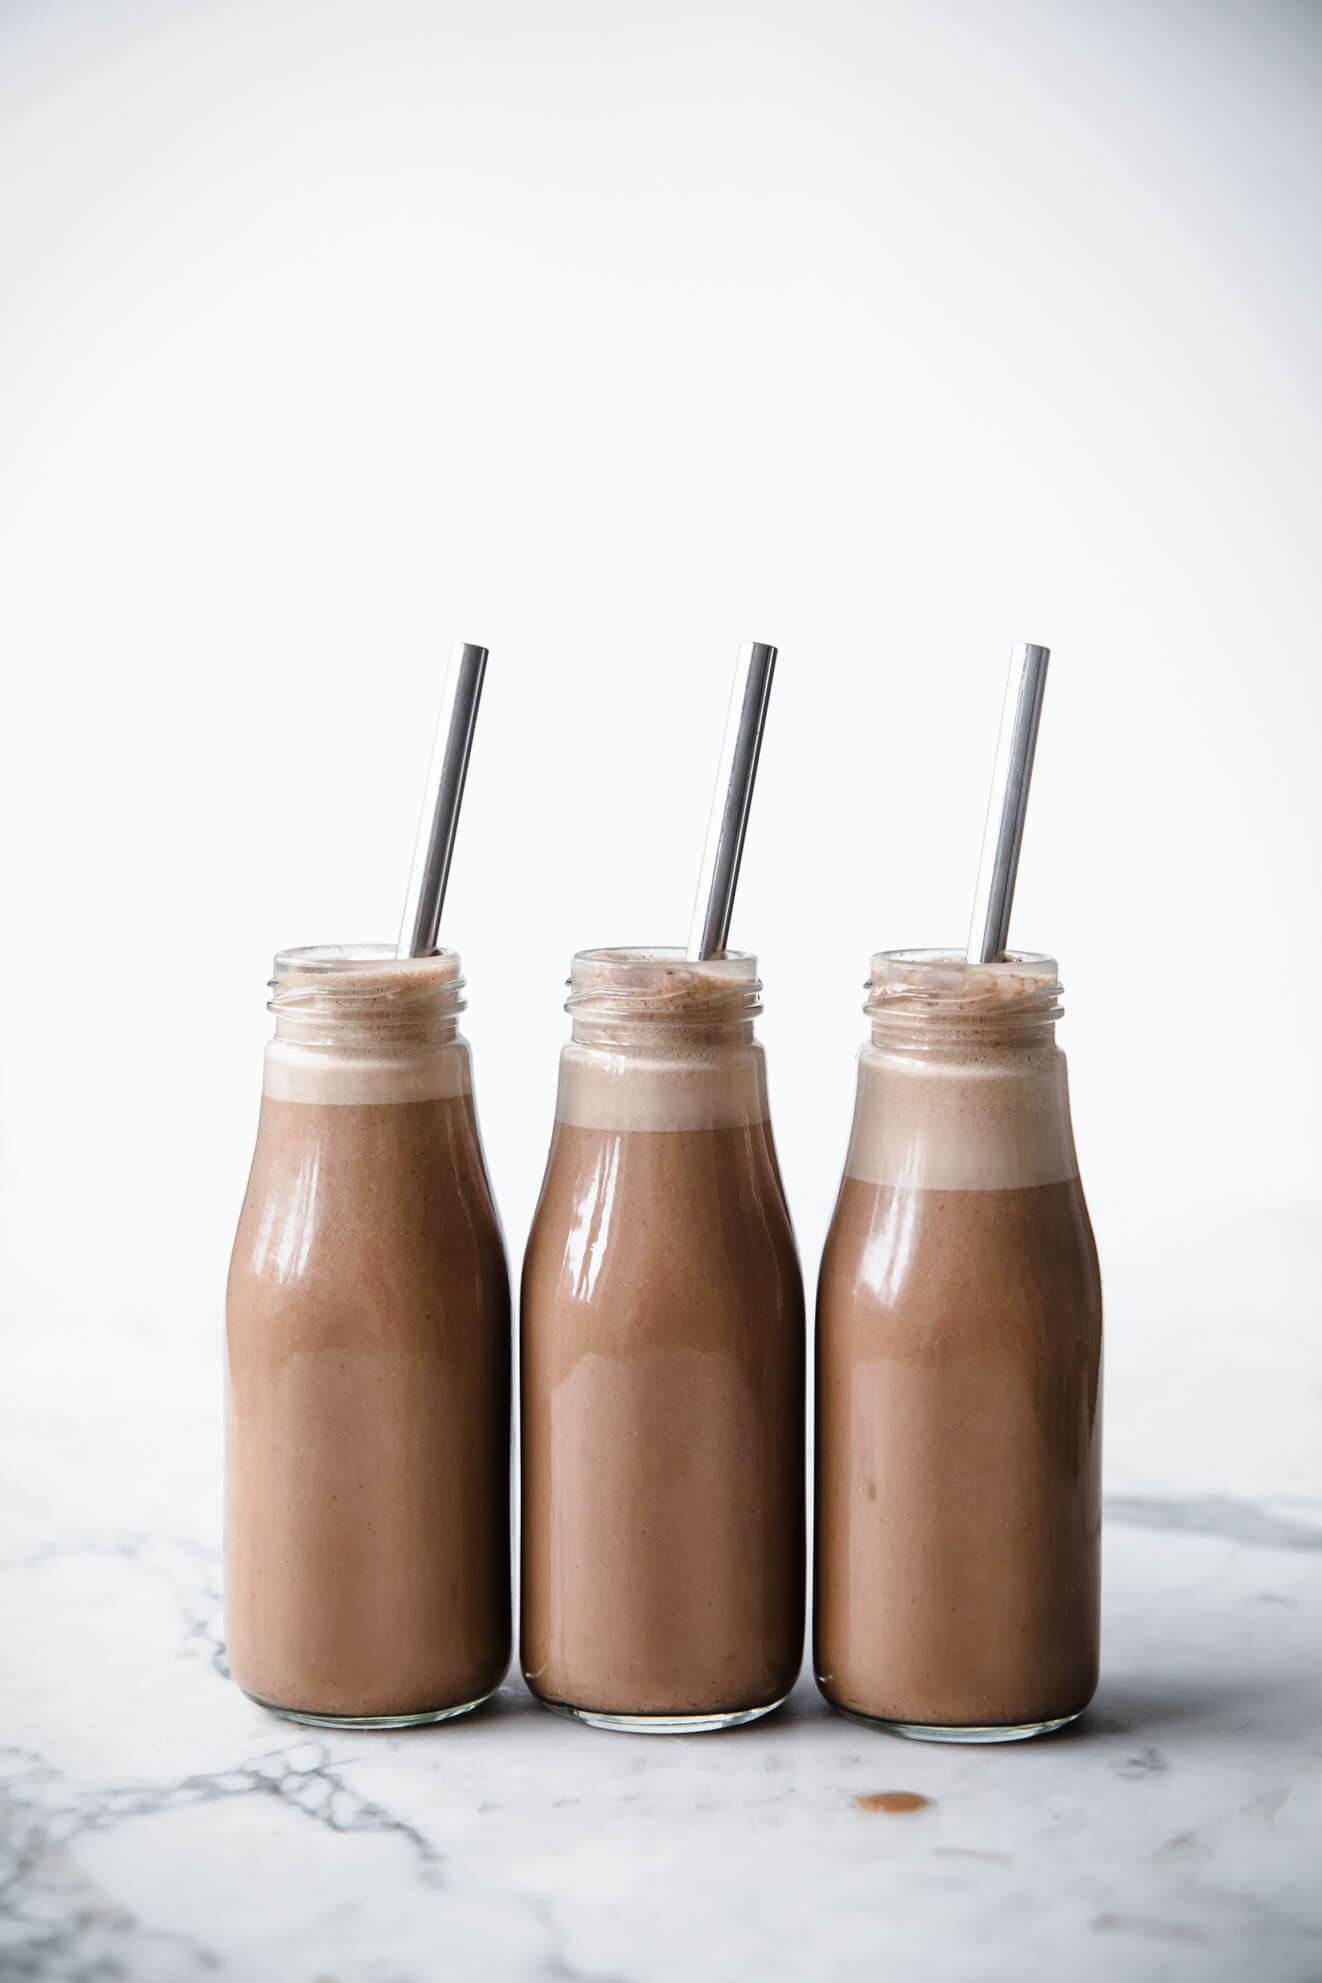 1 Minute Vegan Chocolate Hazelnut Milk